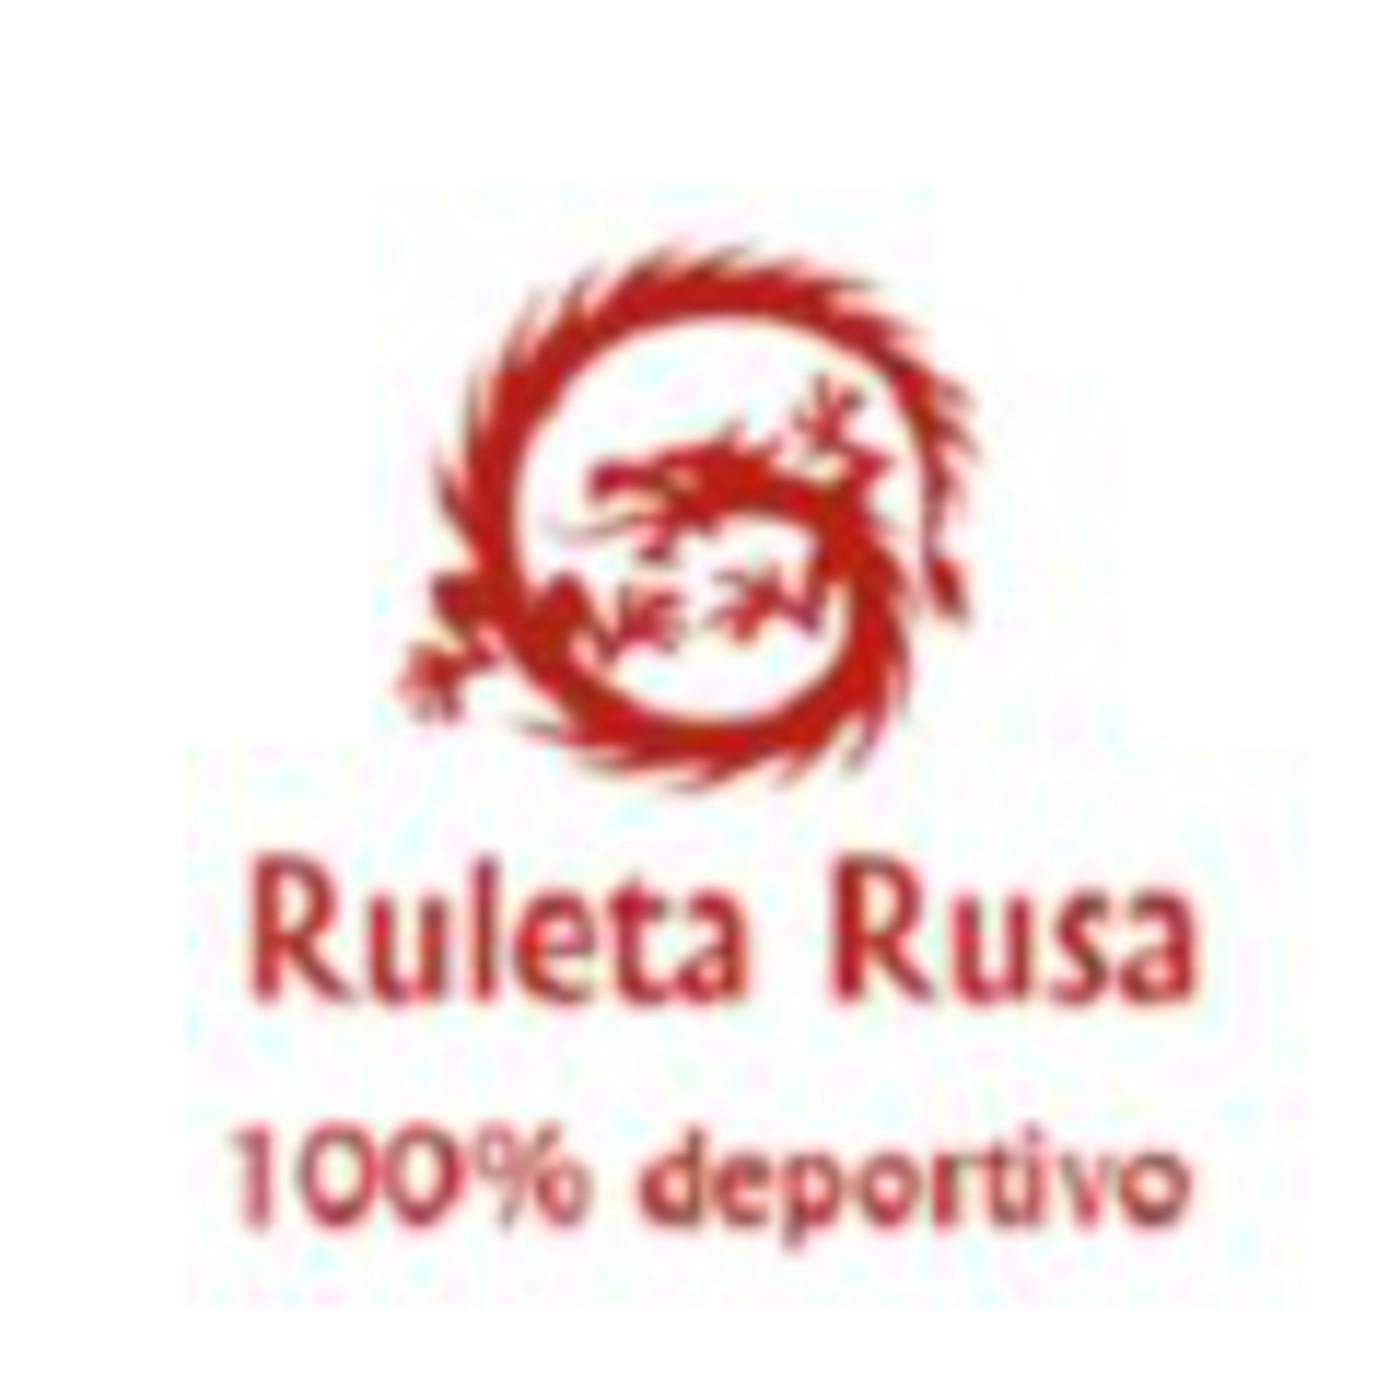 Ruleta Rusa Podcast